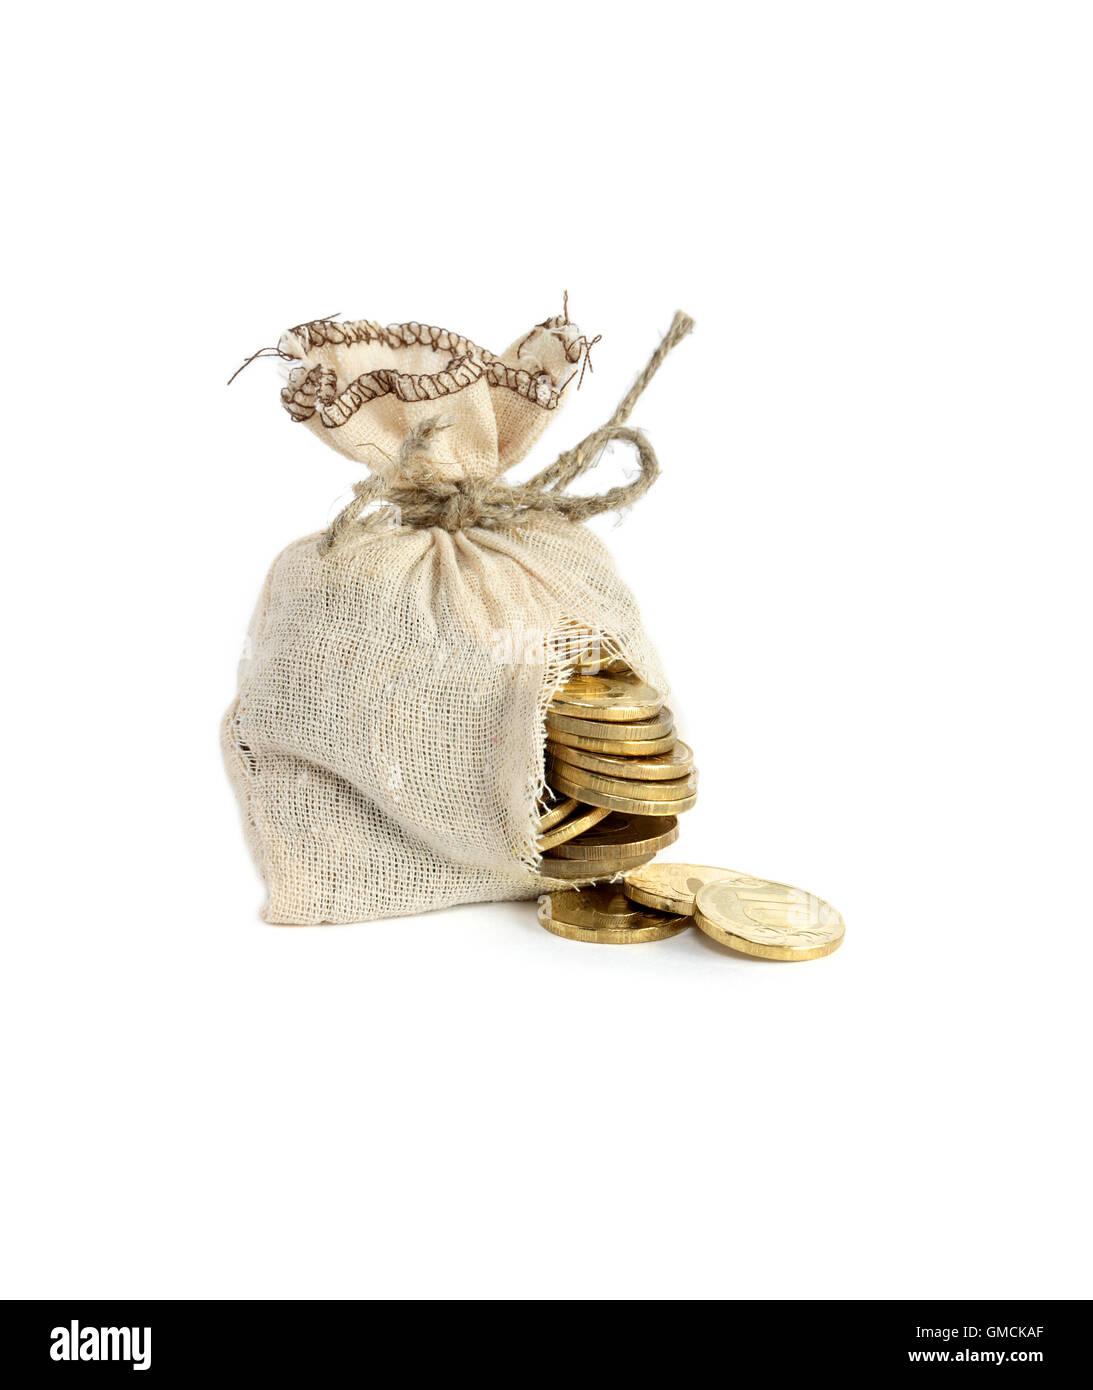 Hole-Ridden Budget - Stock Image